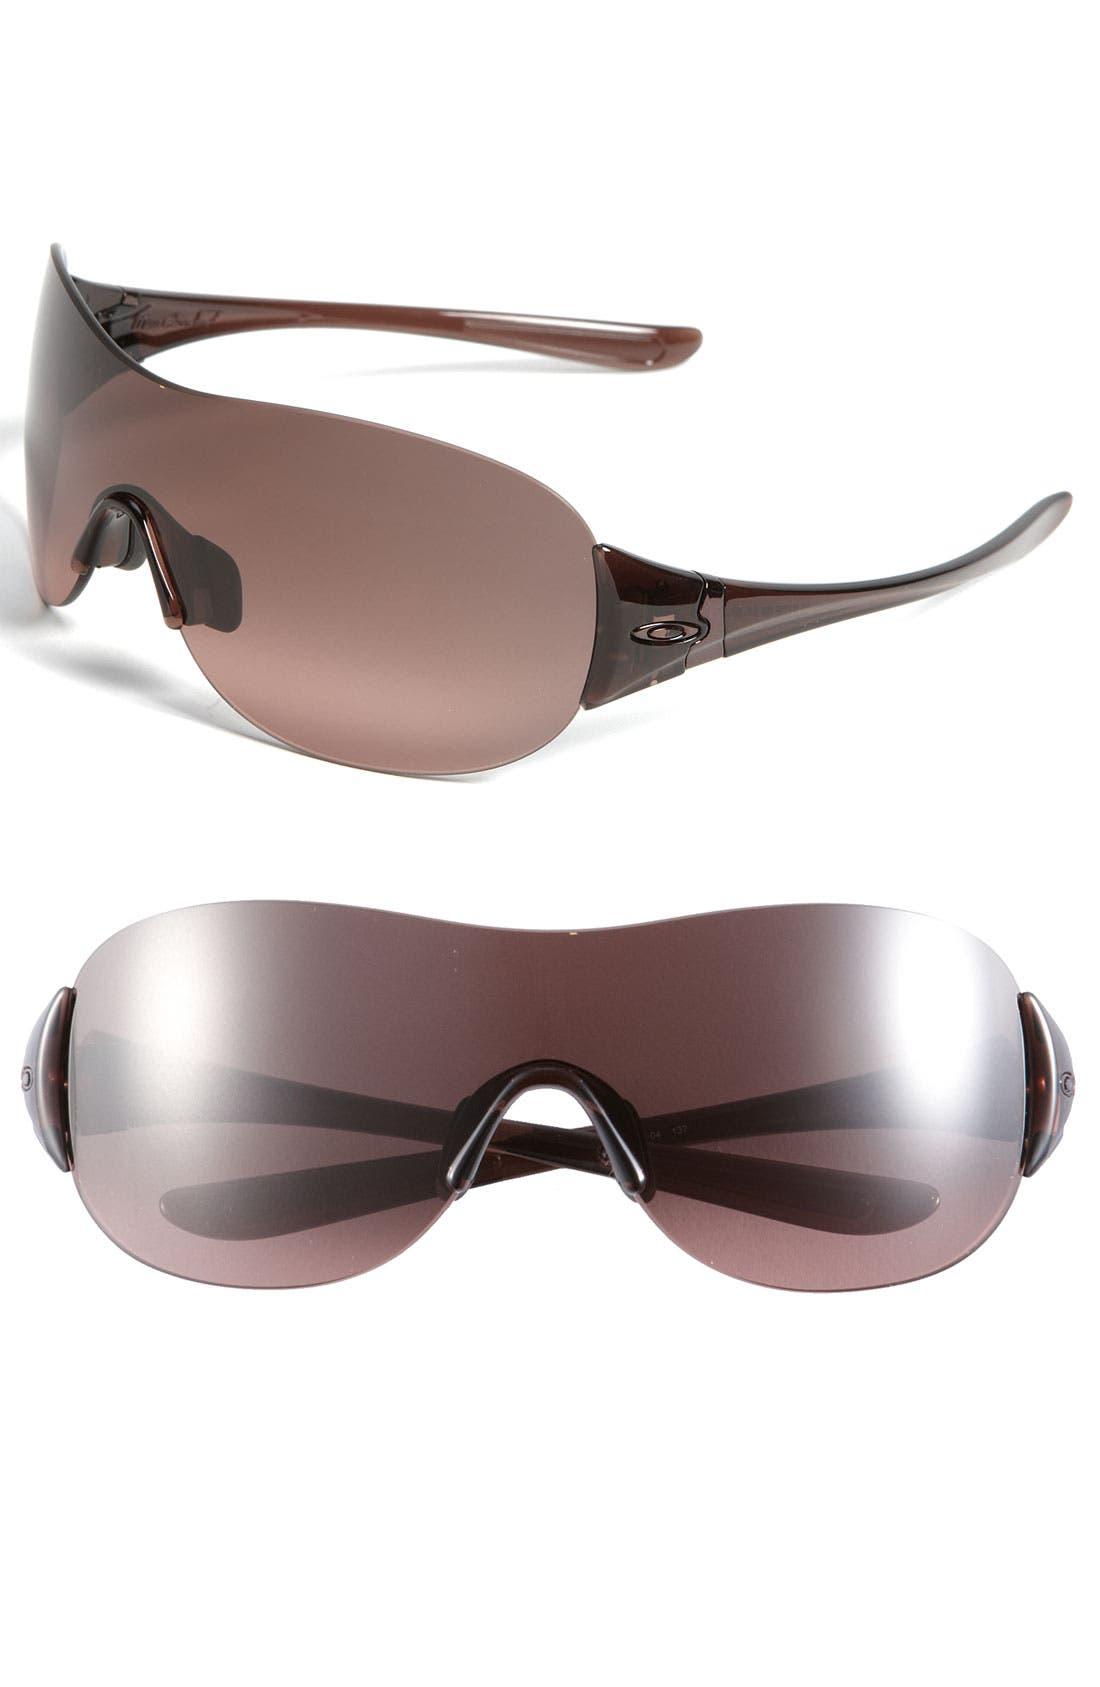 Main Image - Oakley 'Miss Conduct™' Rimless Shield Sunglasses